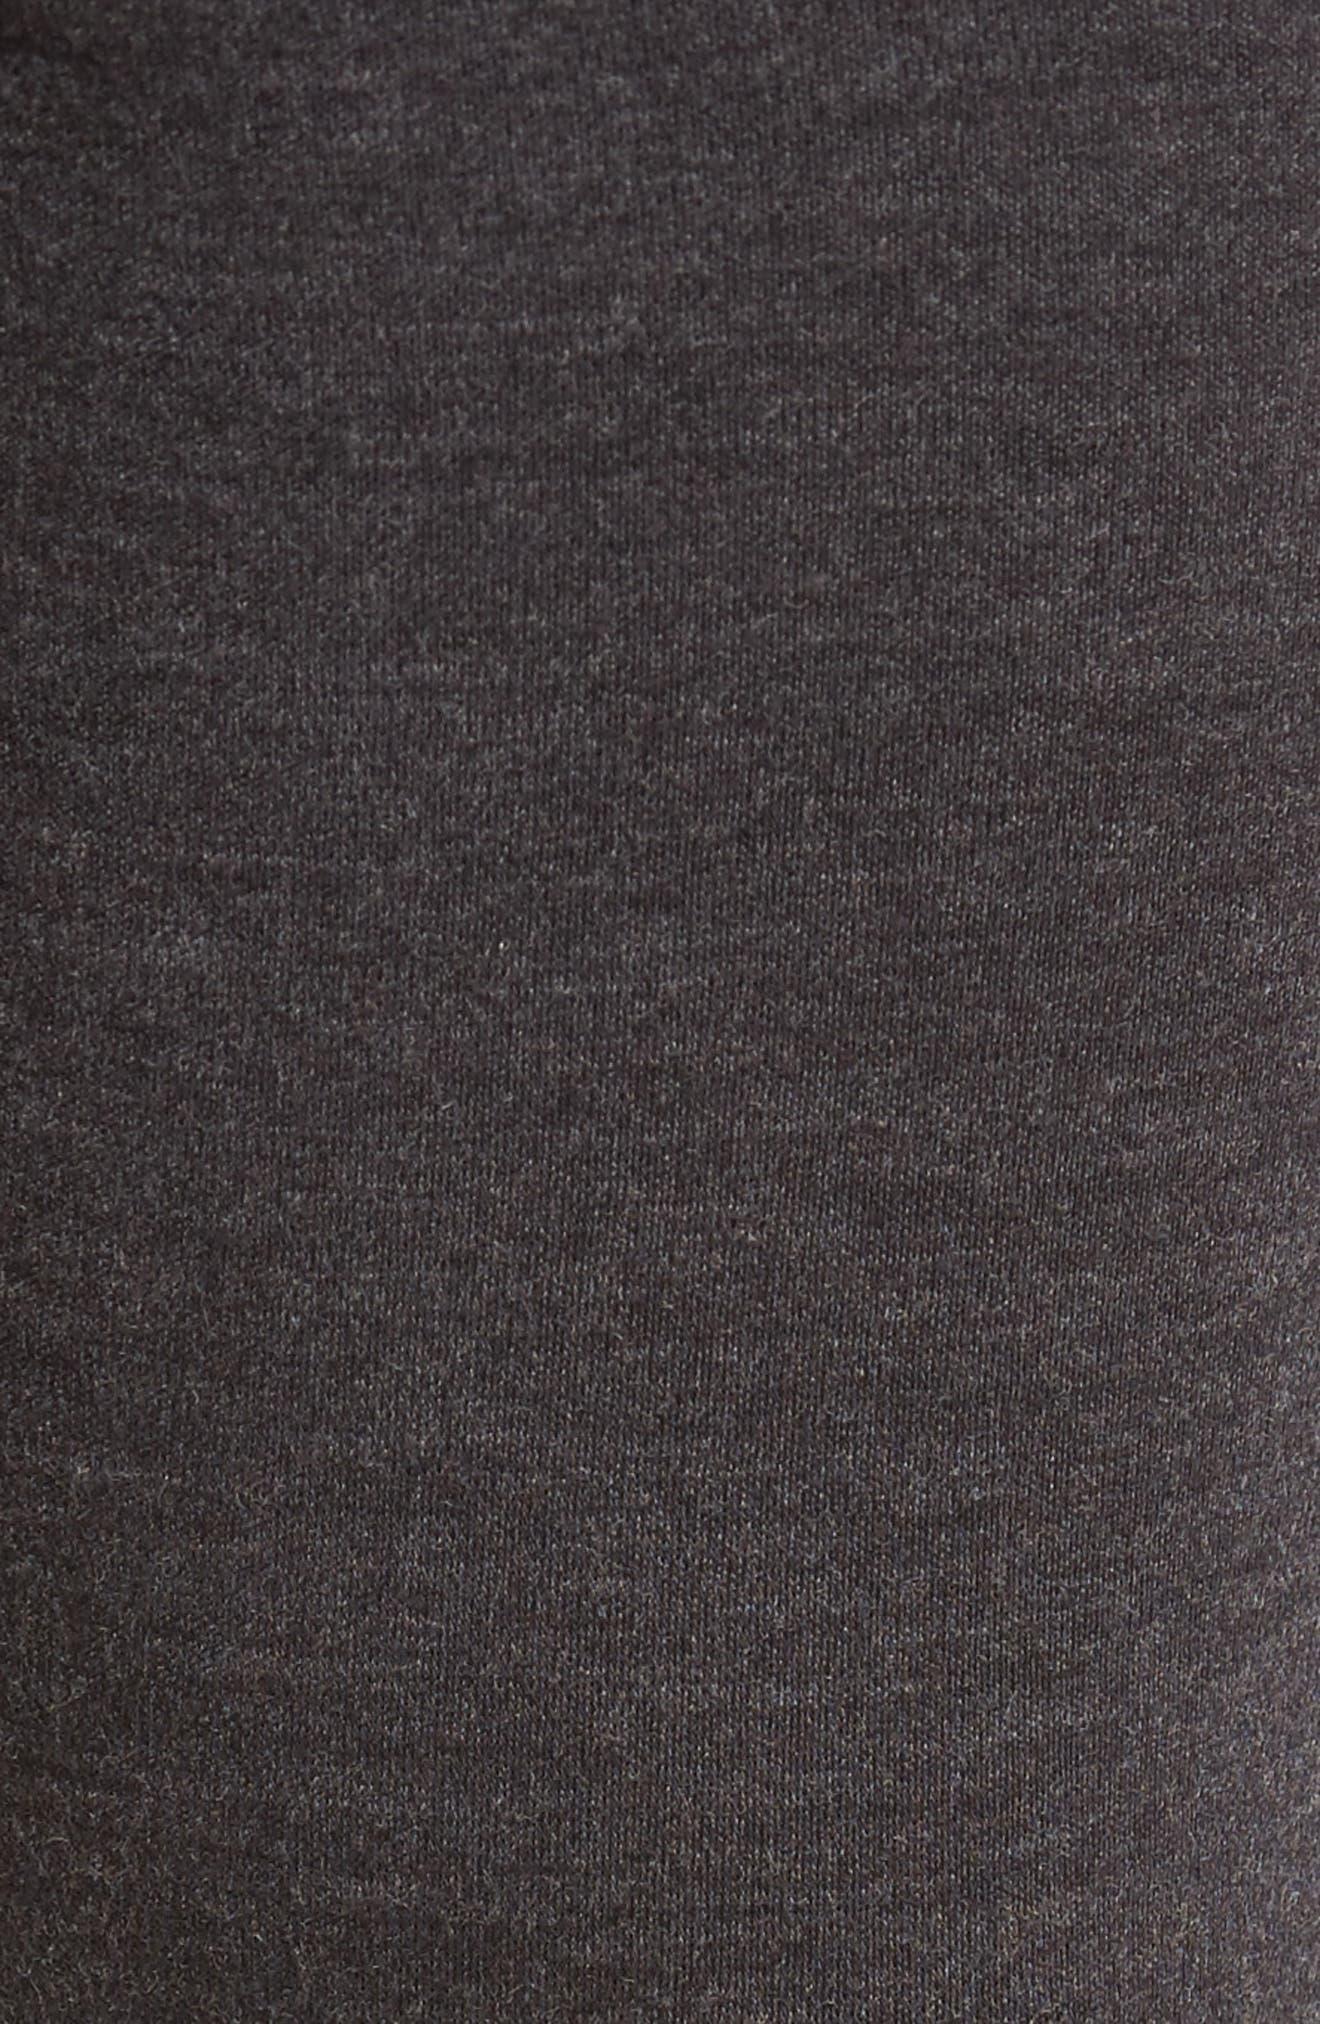 250 Merino Wool Jogger Pants,                             Alternate thumbnail 5, color,                             CHARCOAL